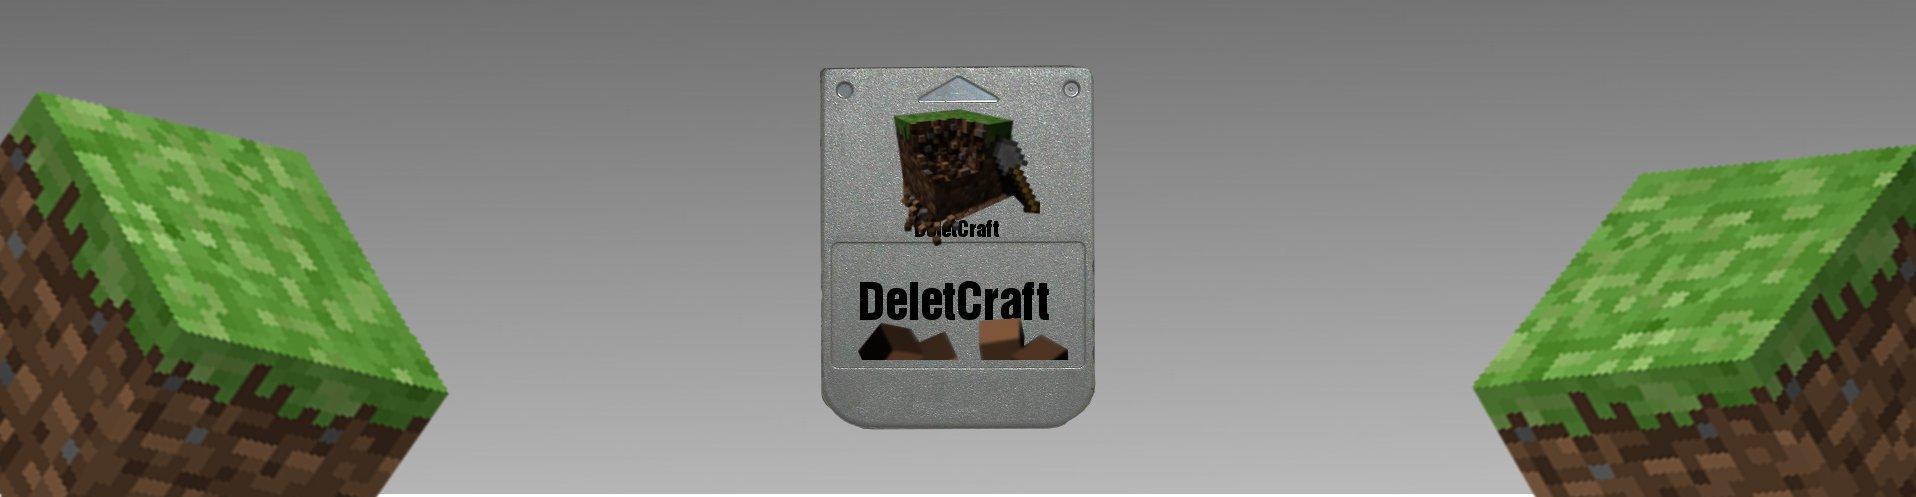 DeletCraft Index du Forum